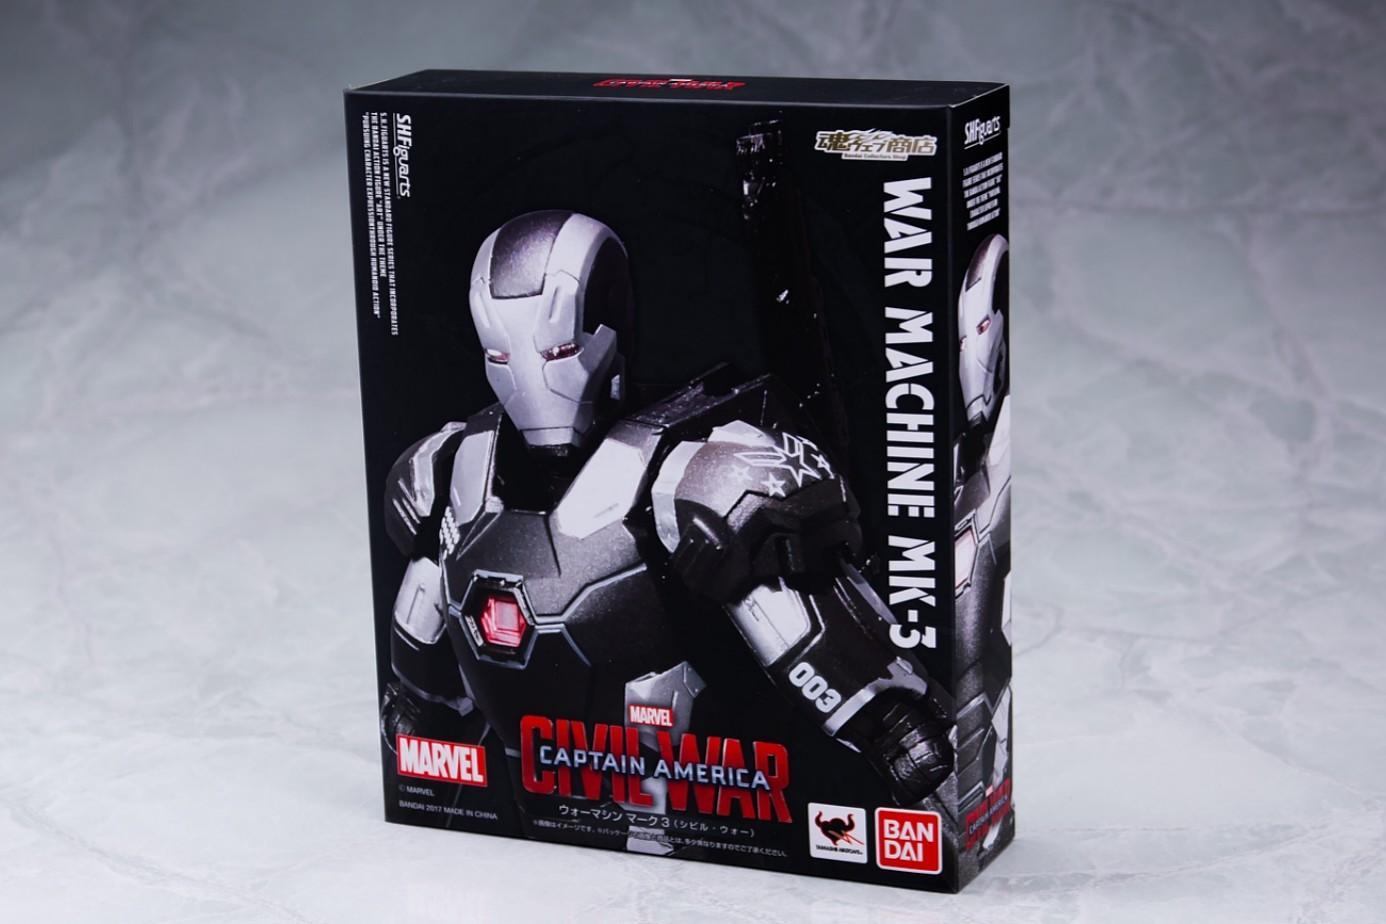 S.H.Figuarts Captain America Civil War WAR MACHINE MARK 3 III Figure BANDAI used